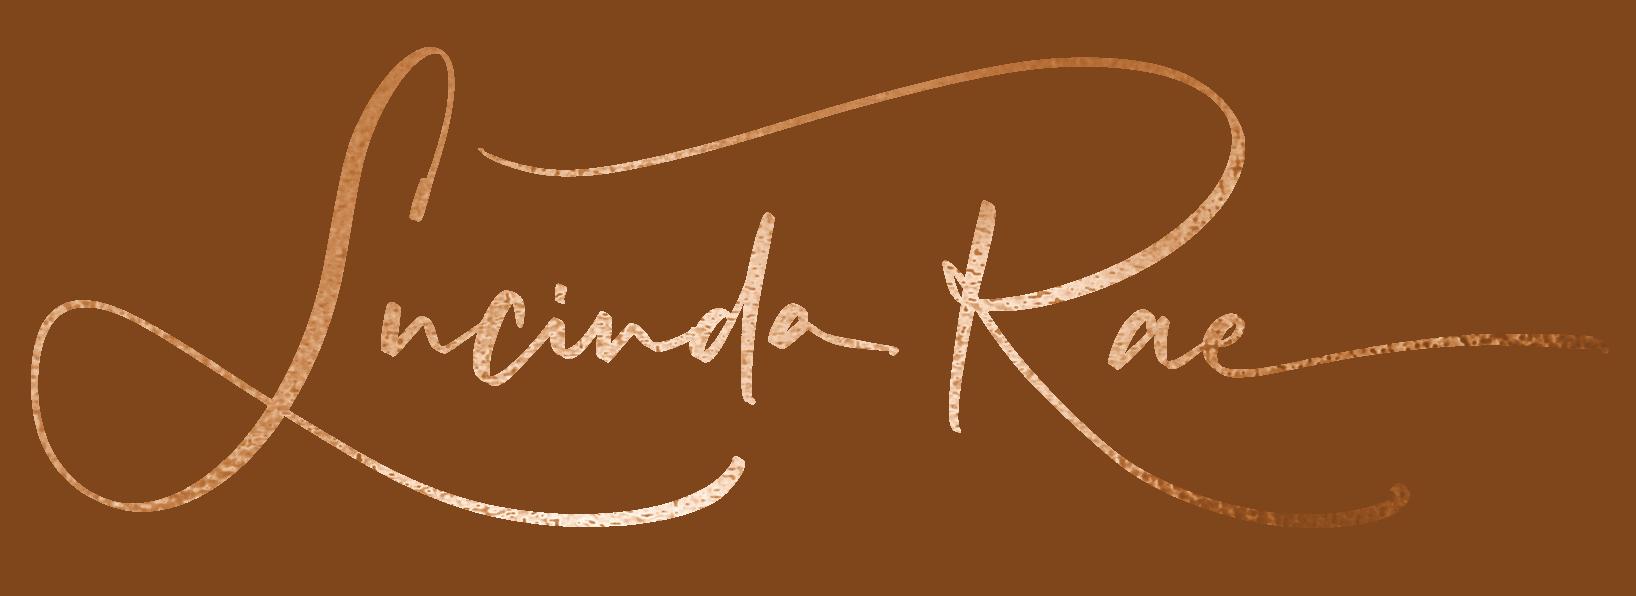 Lucinda Rae